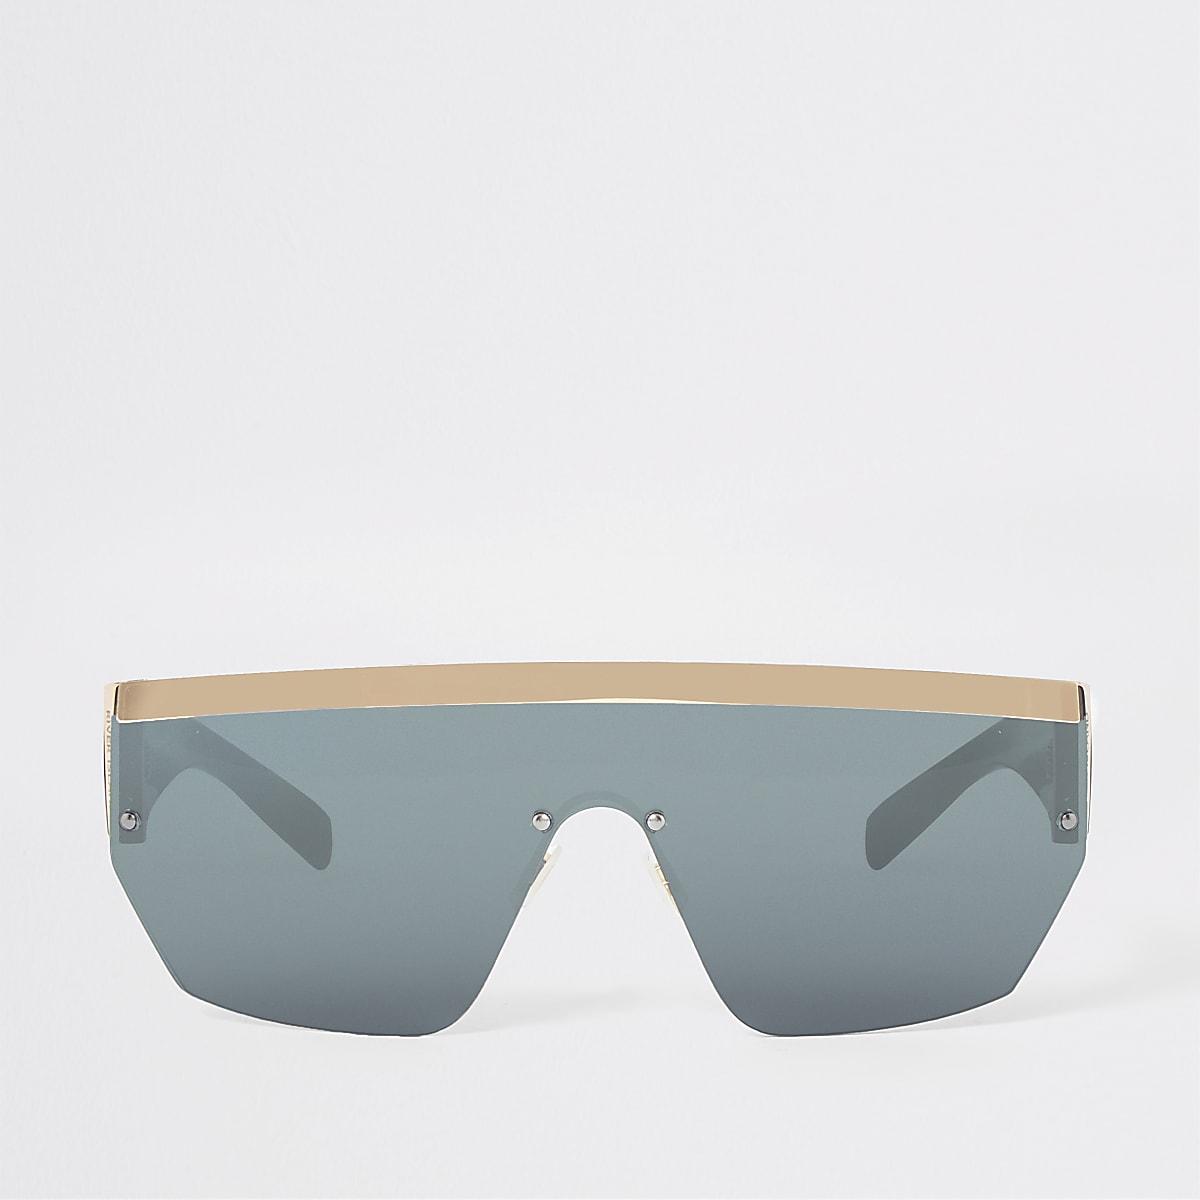 Gold tone visor flat top sunglasses